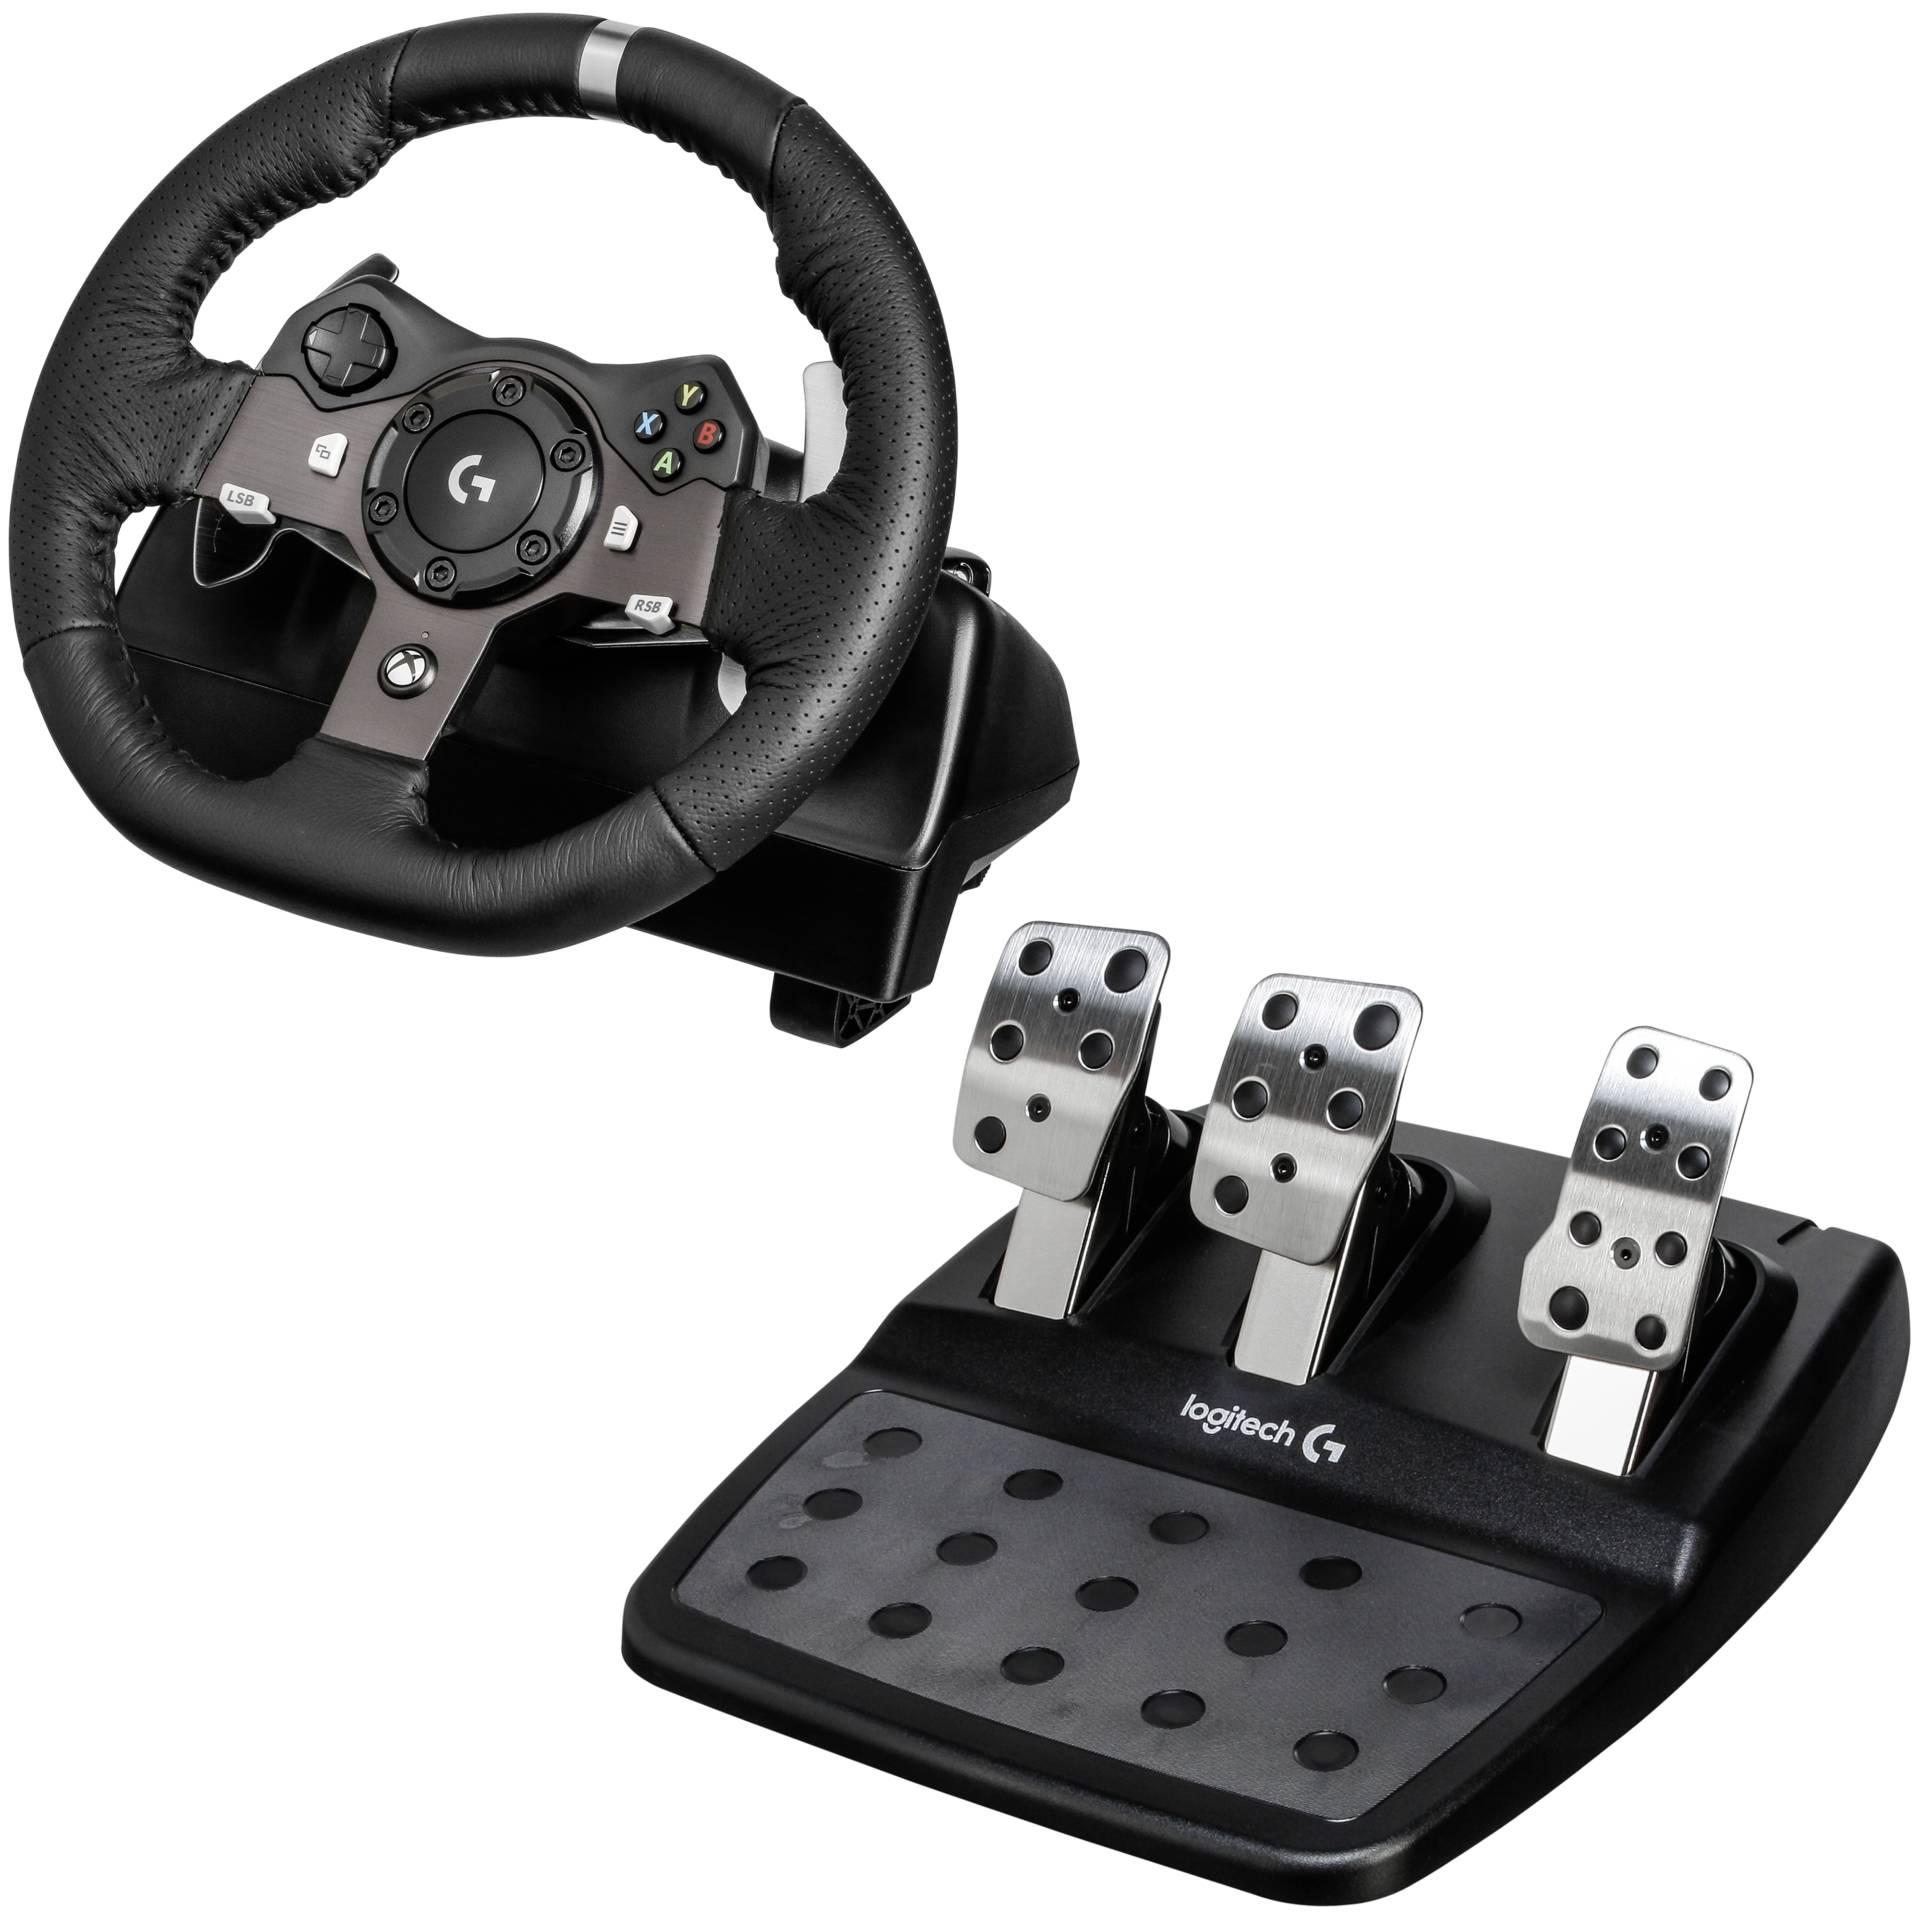 "Logitech""Lenkrad Logitech G920 Driving Force Rennlenkrad [hardware/electronic] G920 Driving Force, Lenkrad"""